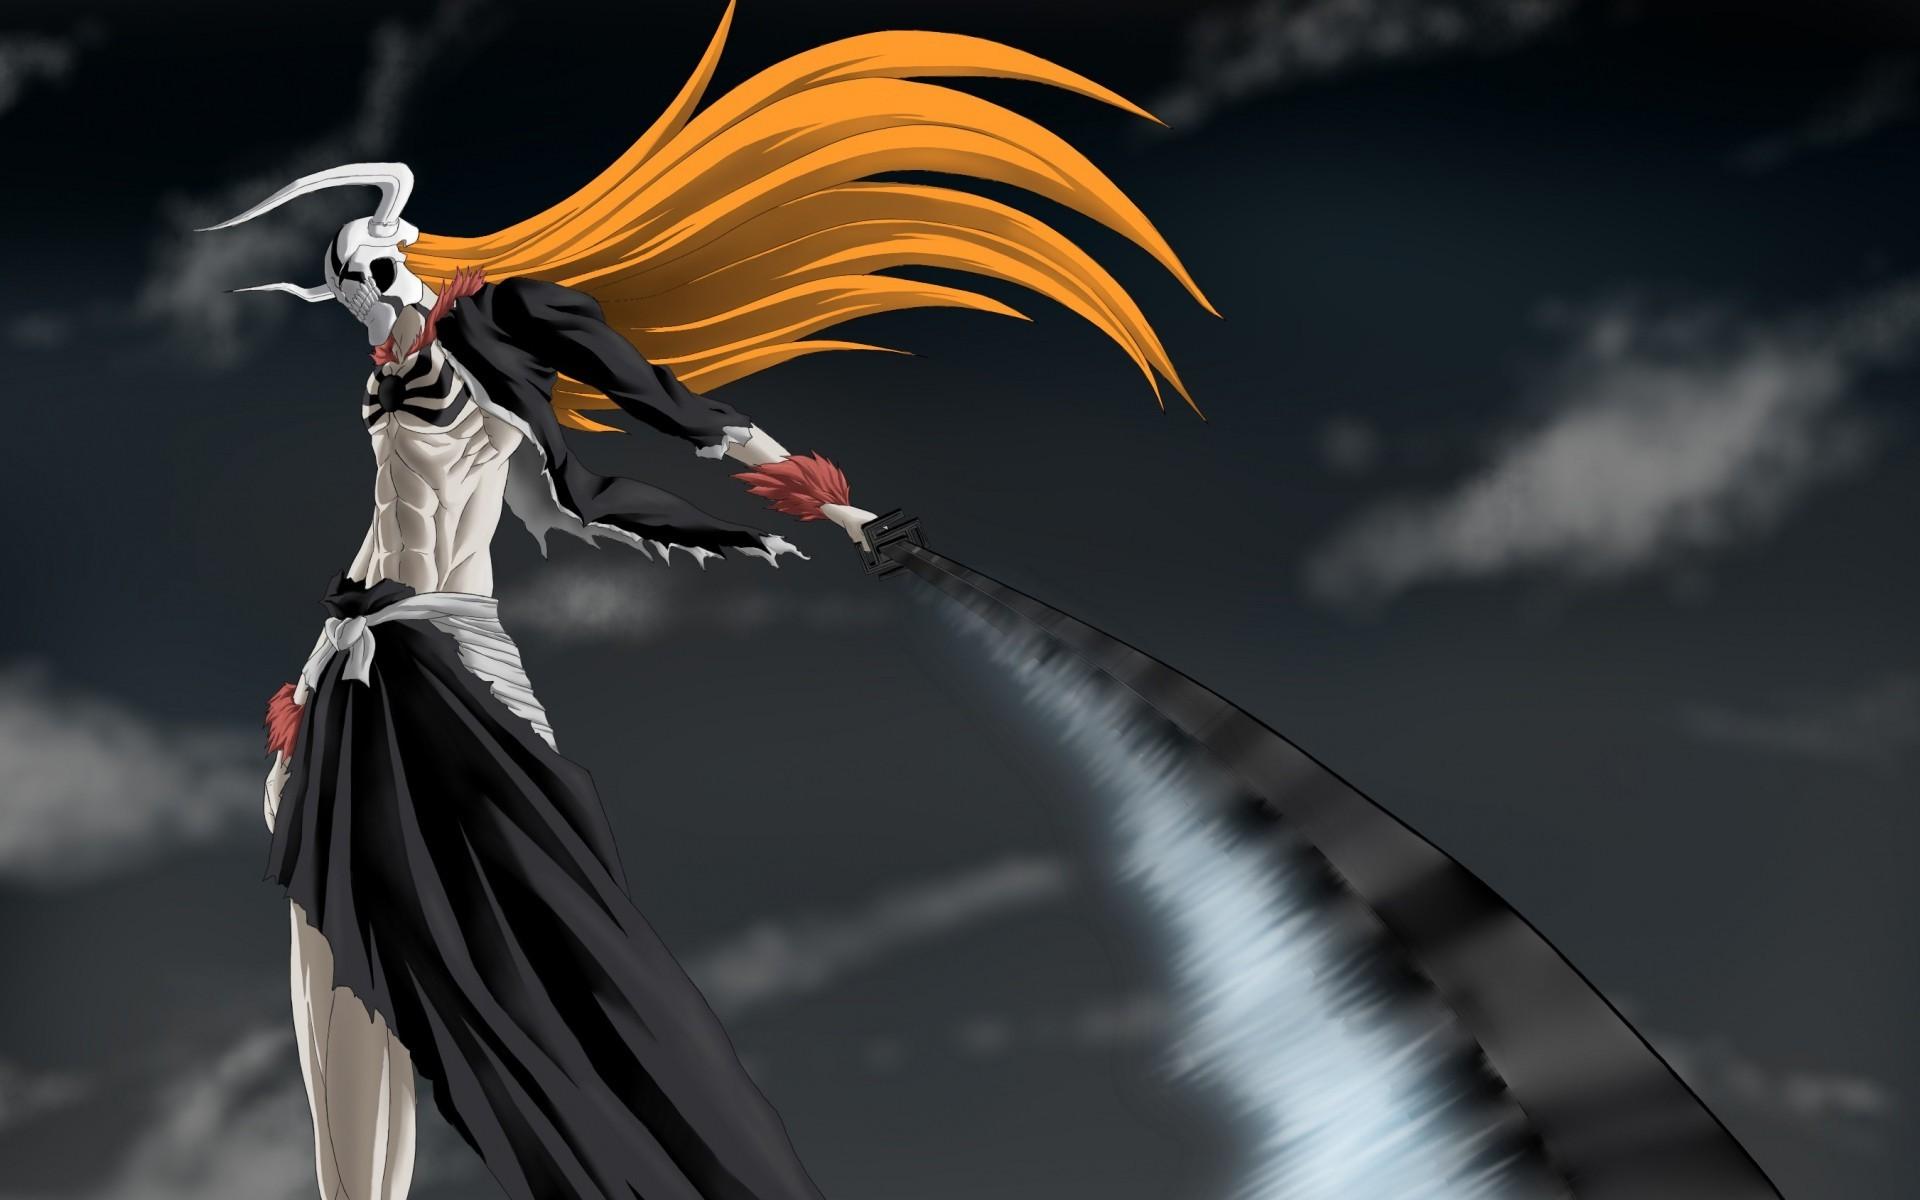 Wallpaper Anime Manga Bleach Darkness Wing Screenshot